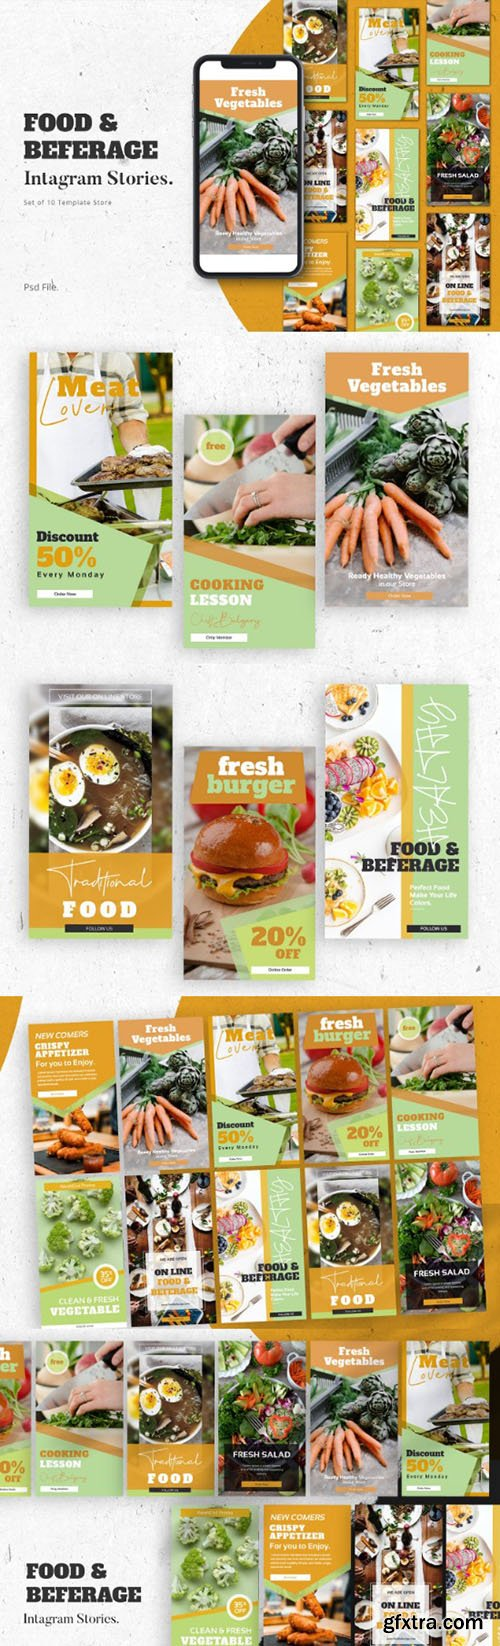 Food & Beferage Instagram Stories Template